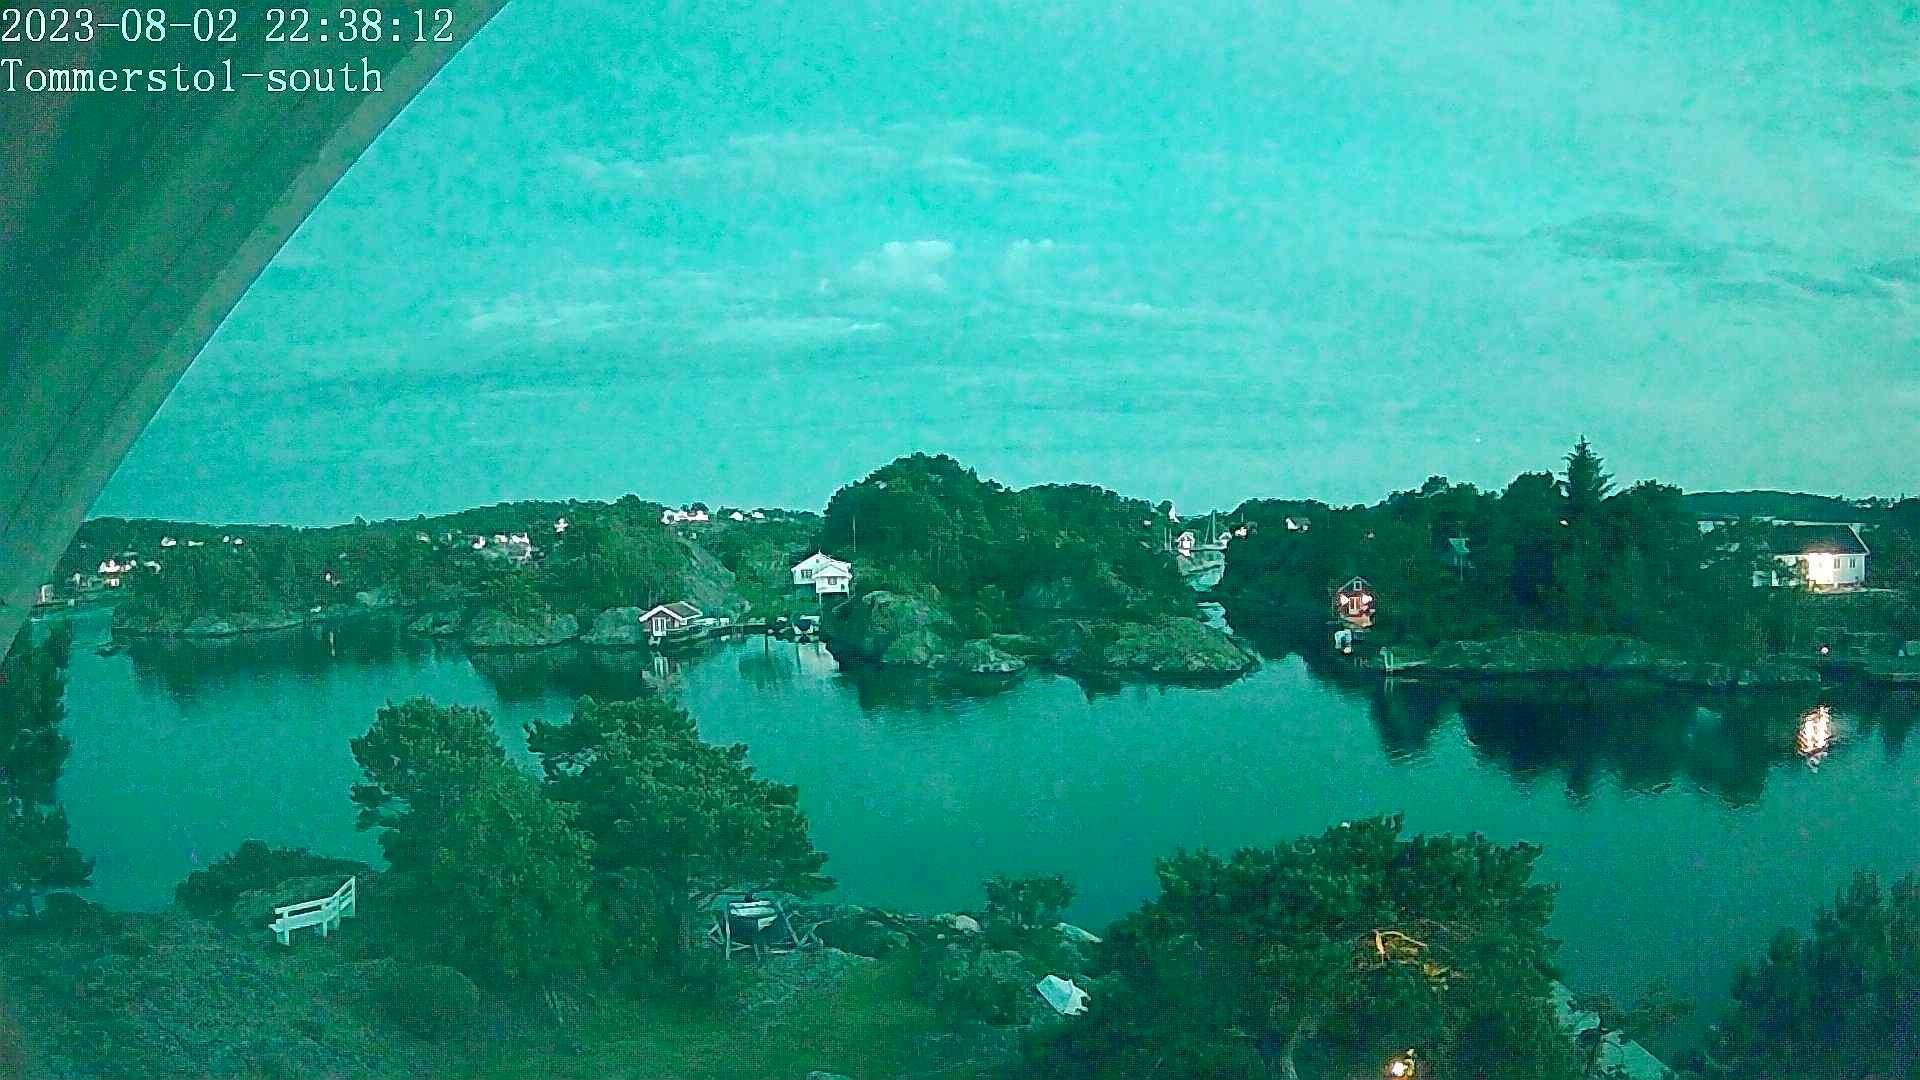 Webcam Rabbersvik › South: Teistholmen − Kristiansand fer